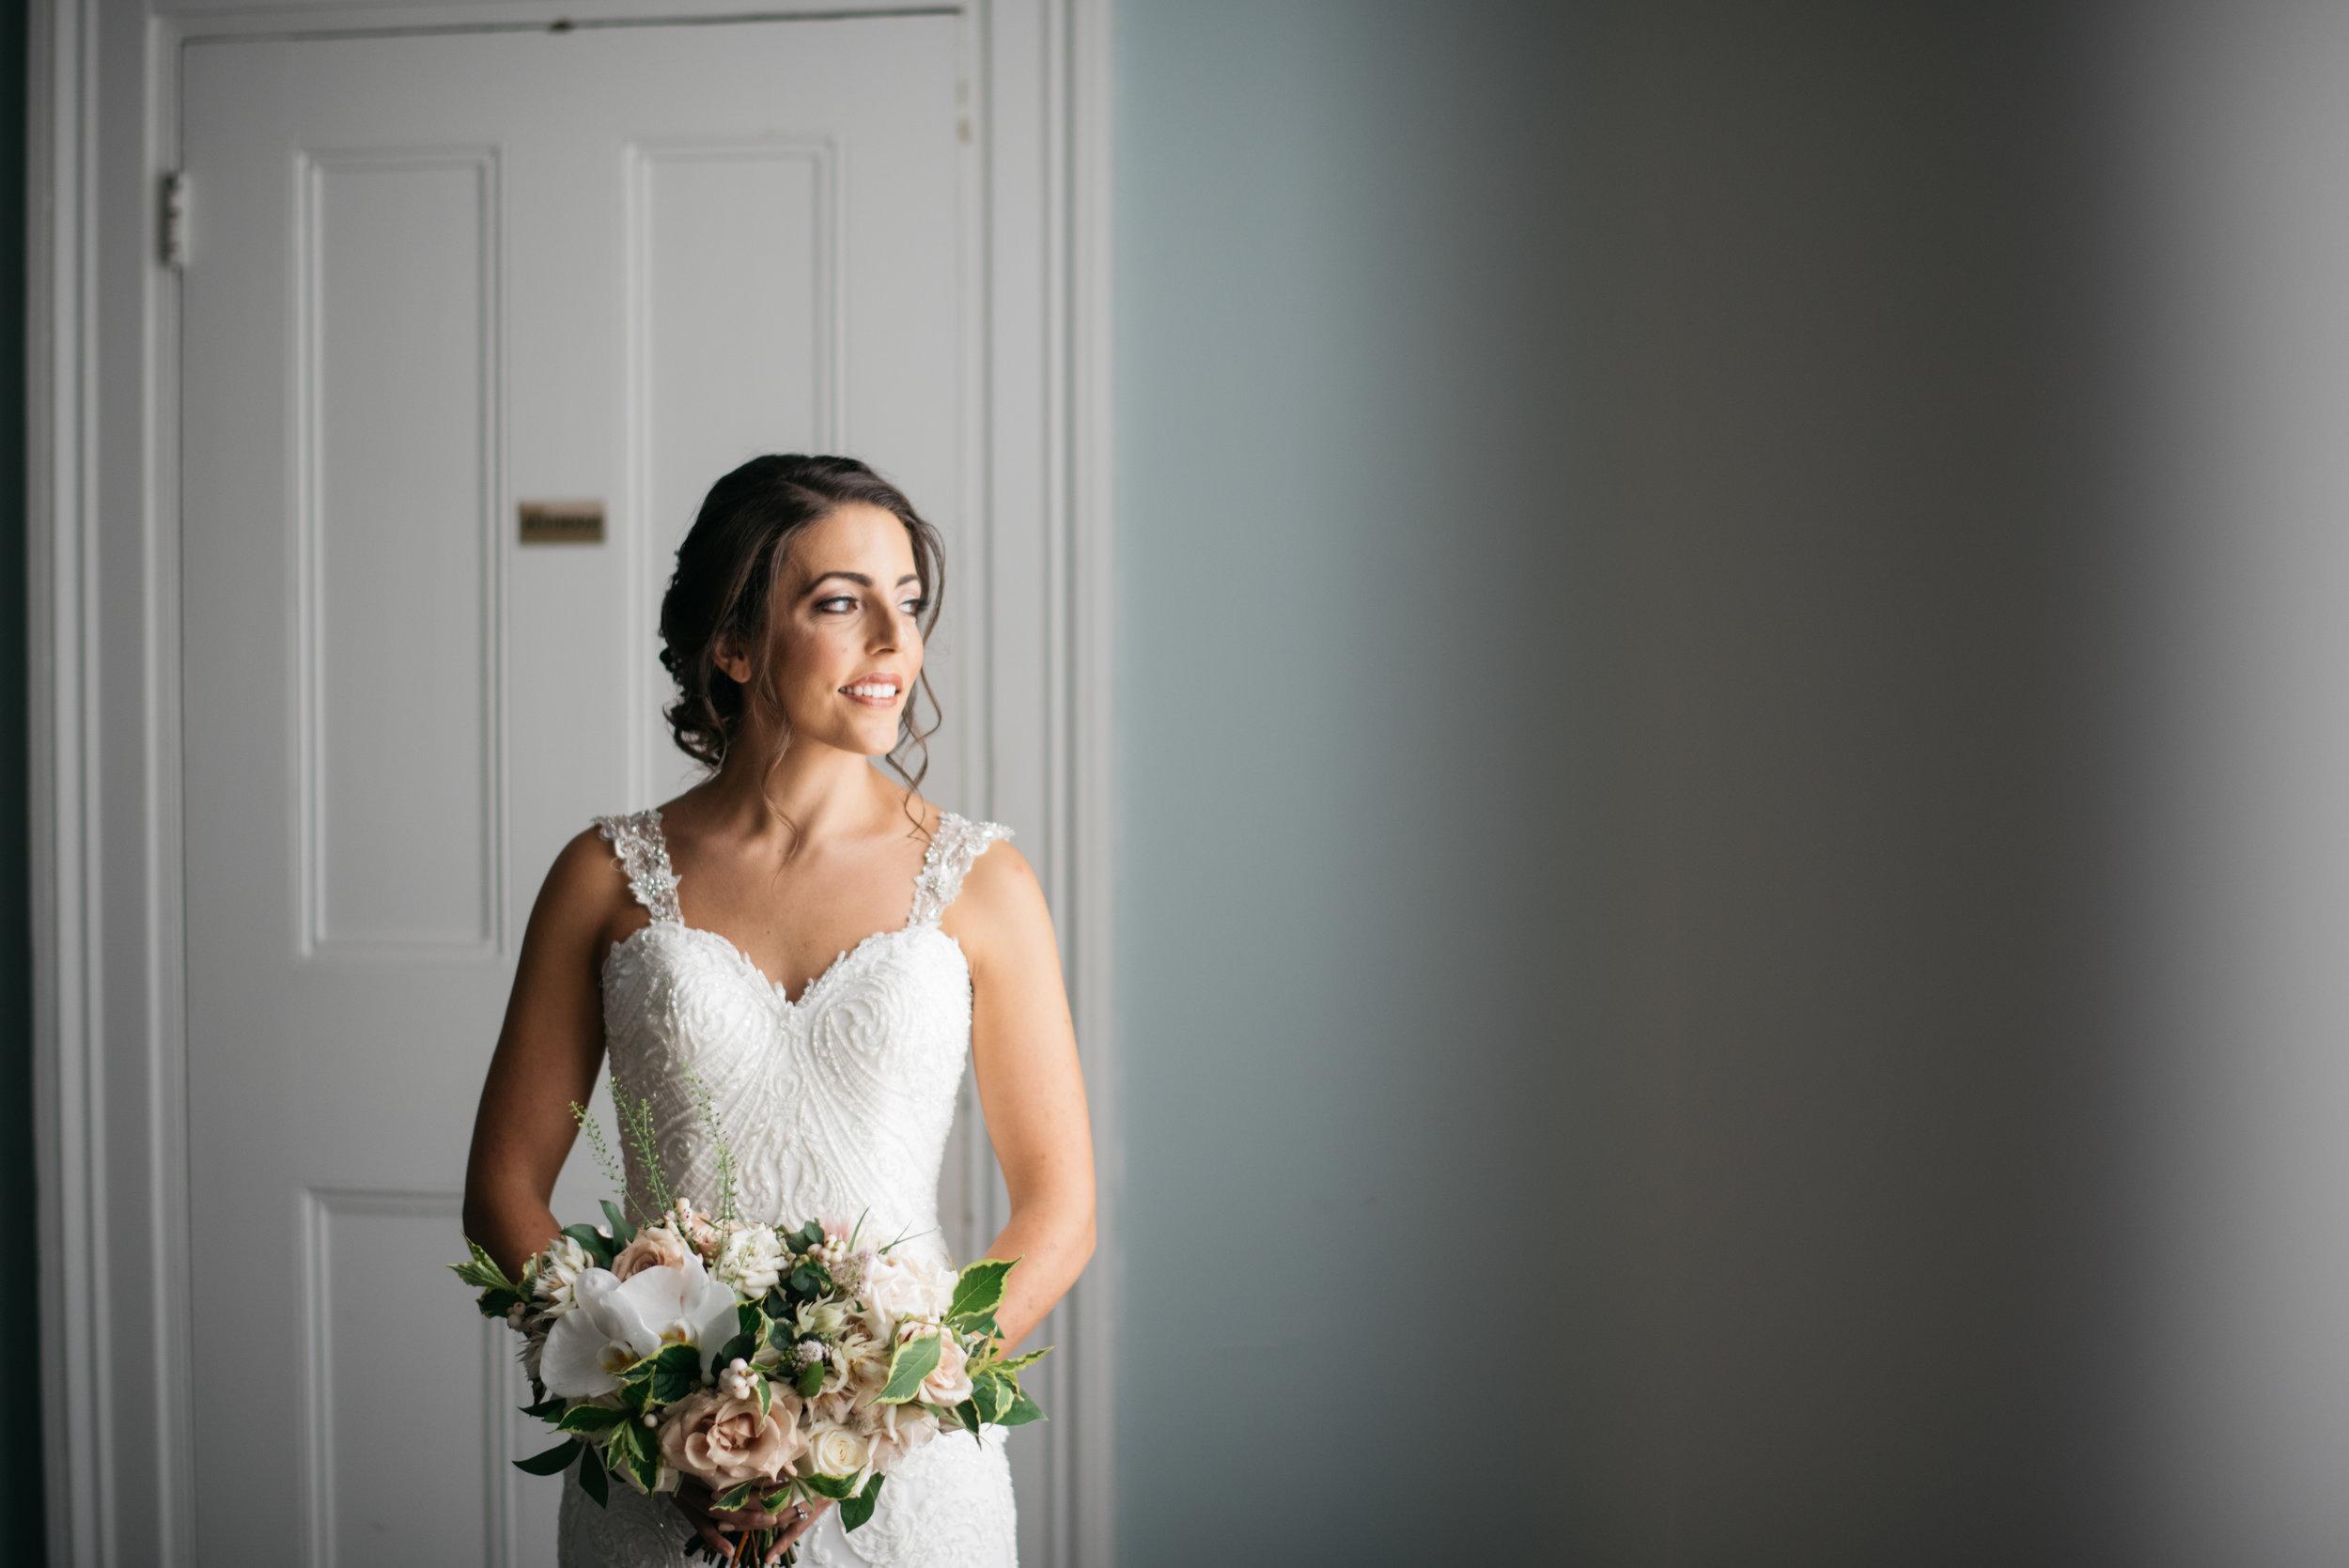 WeddingPhotos | NJPhotographer | Highlights-5-20.jpg